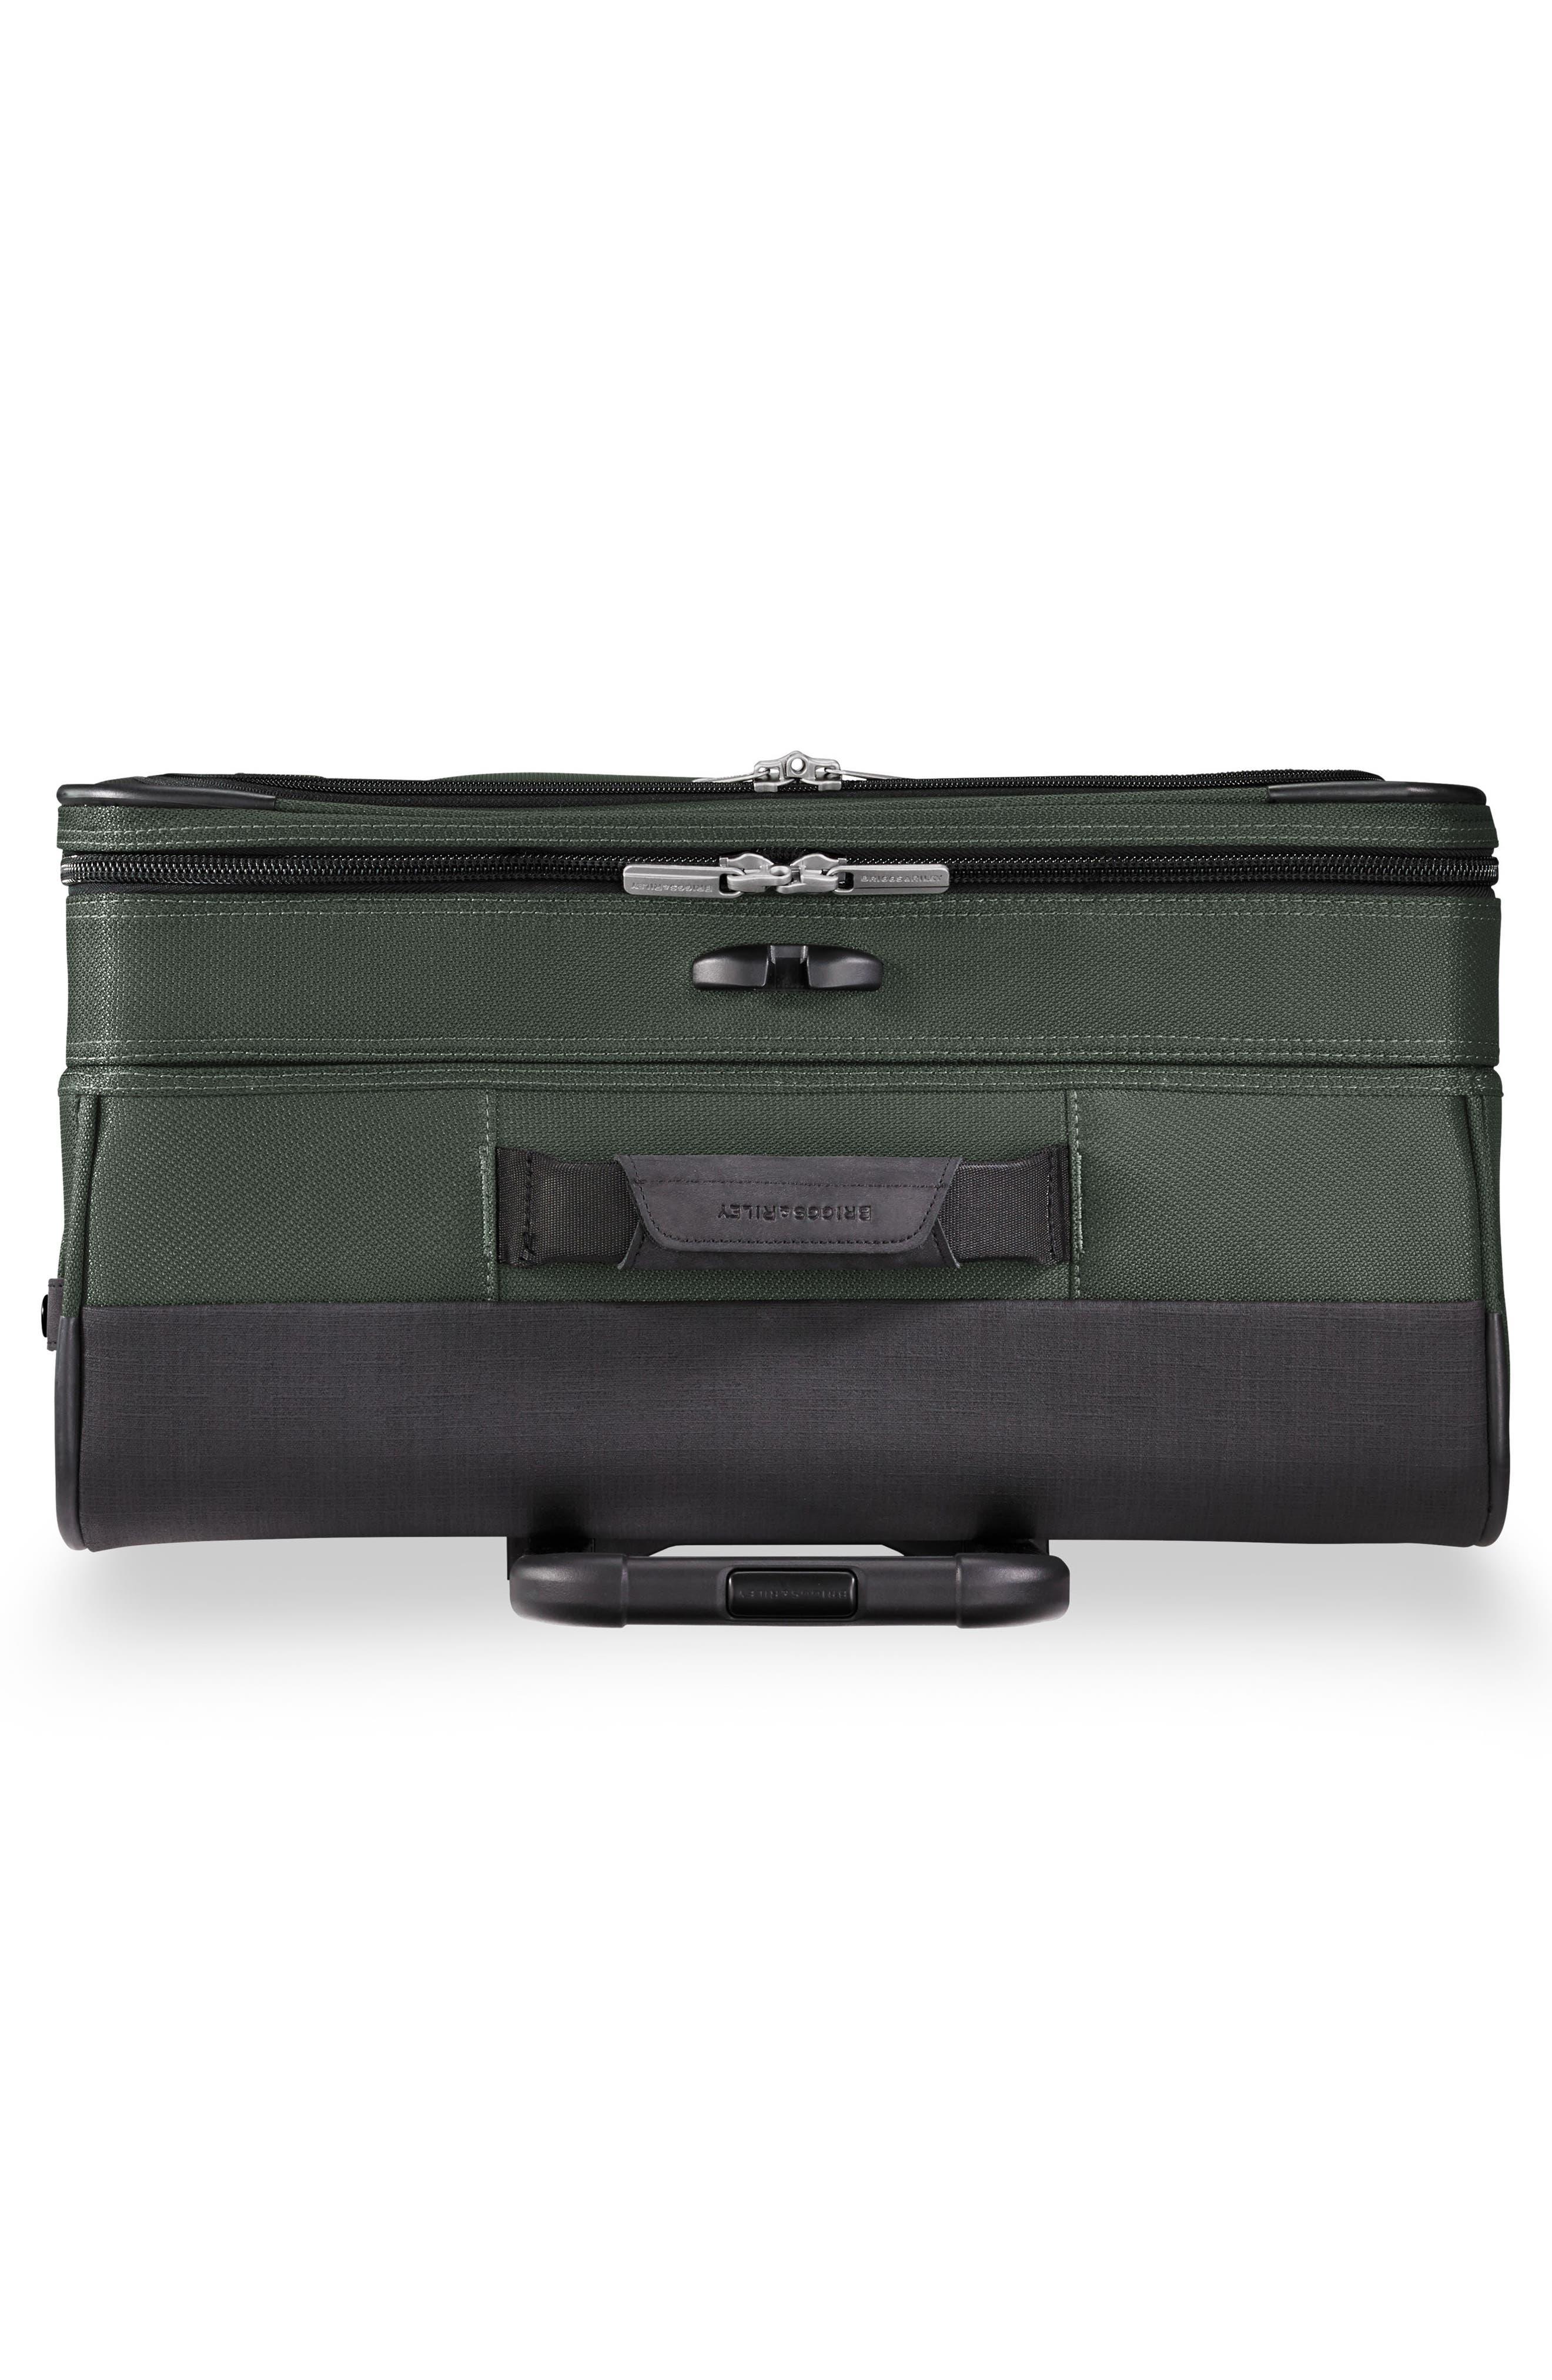 BRIGGS & RILEY,                             Transcend VX Medium Expandable 26-Inch Spinner Suitcase,                             Alternate thumbnail 5, color,                             RAINFOREST GREEN